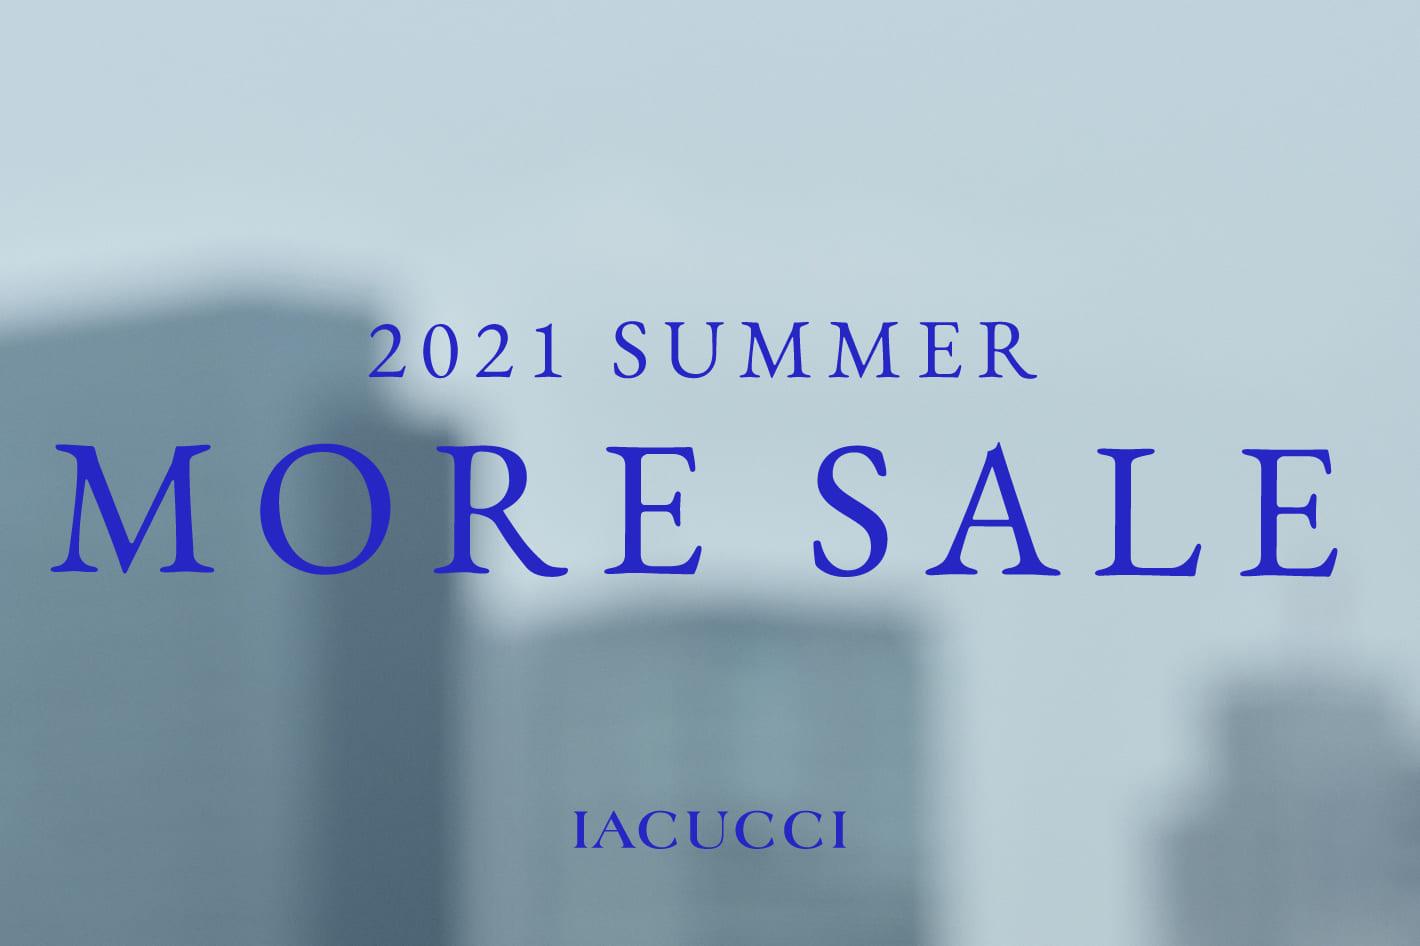 IACUCCI <MORE SALE>セールアイテムがプライスダウン&追加!